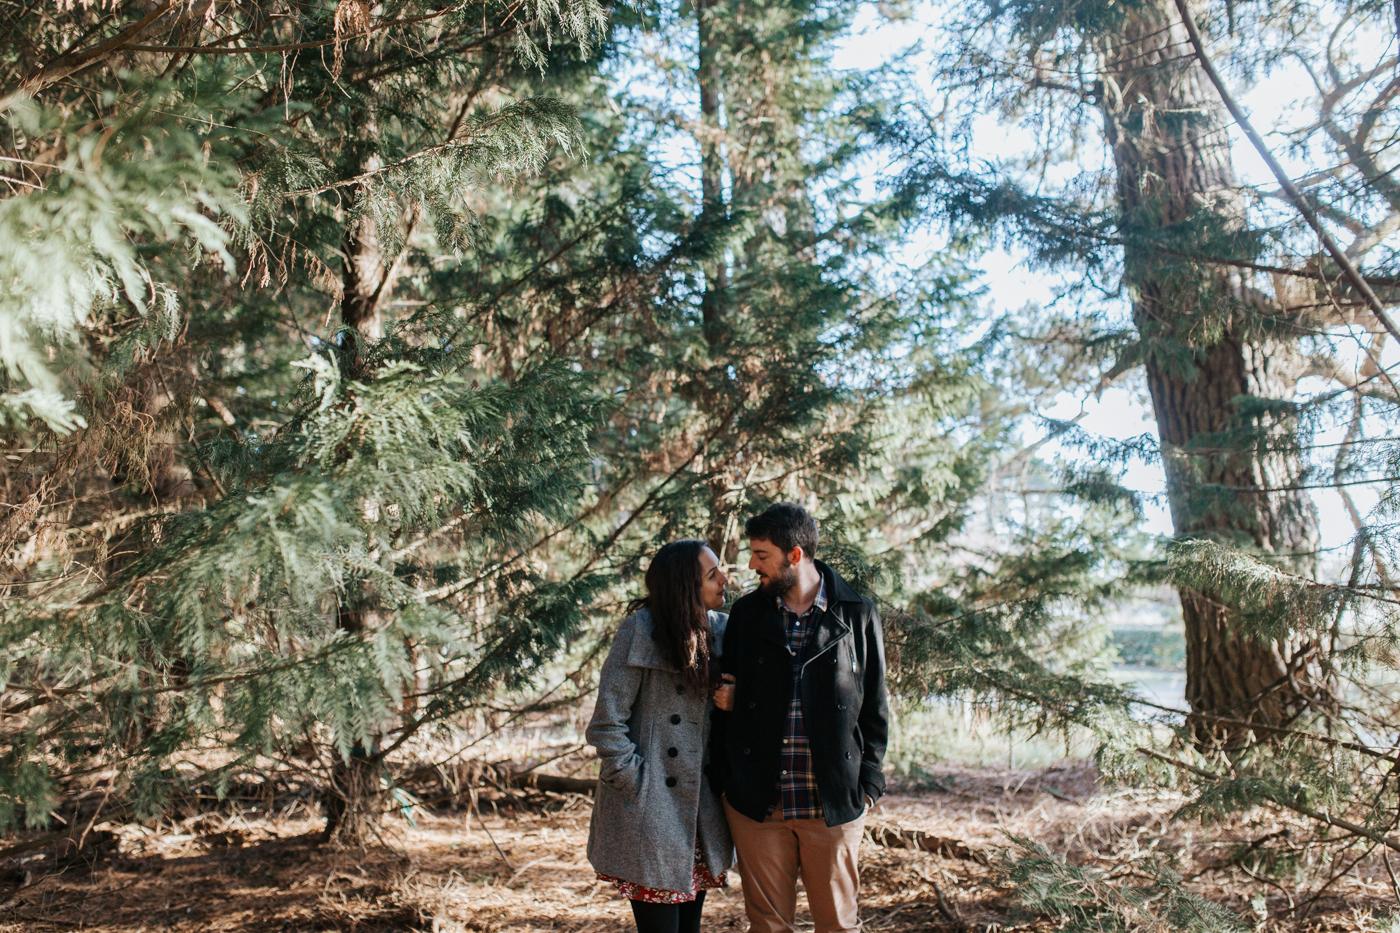 Kate & Kieran - Southern Highlands Engagement - Samantha Heather Photography-43.jpg